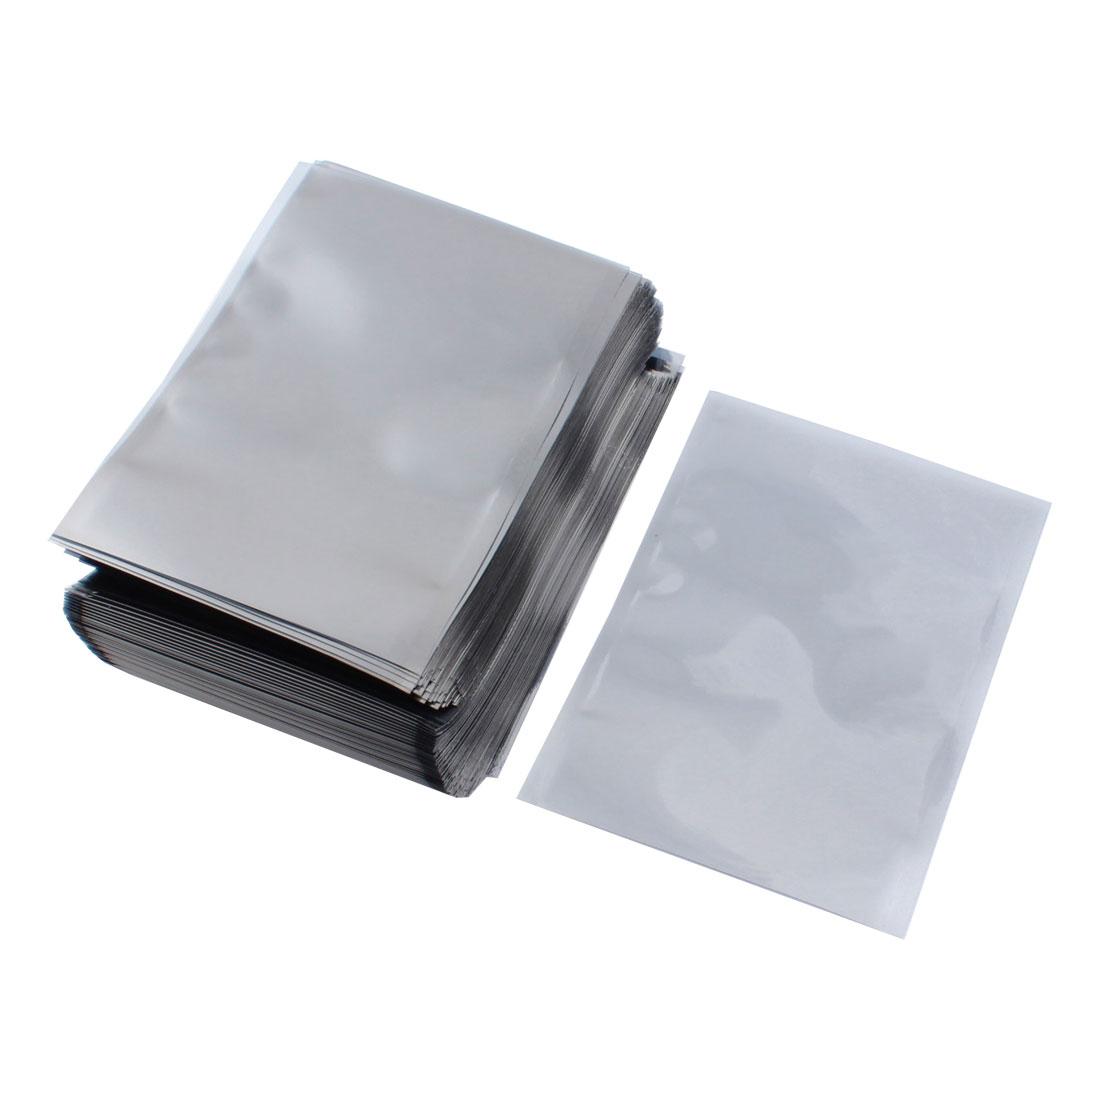 200pcs ESD Shield Open-Top Type Anti-Static Shielding Bags 9cmx12.5cm